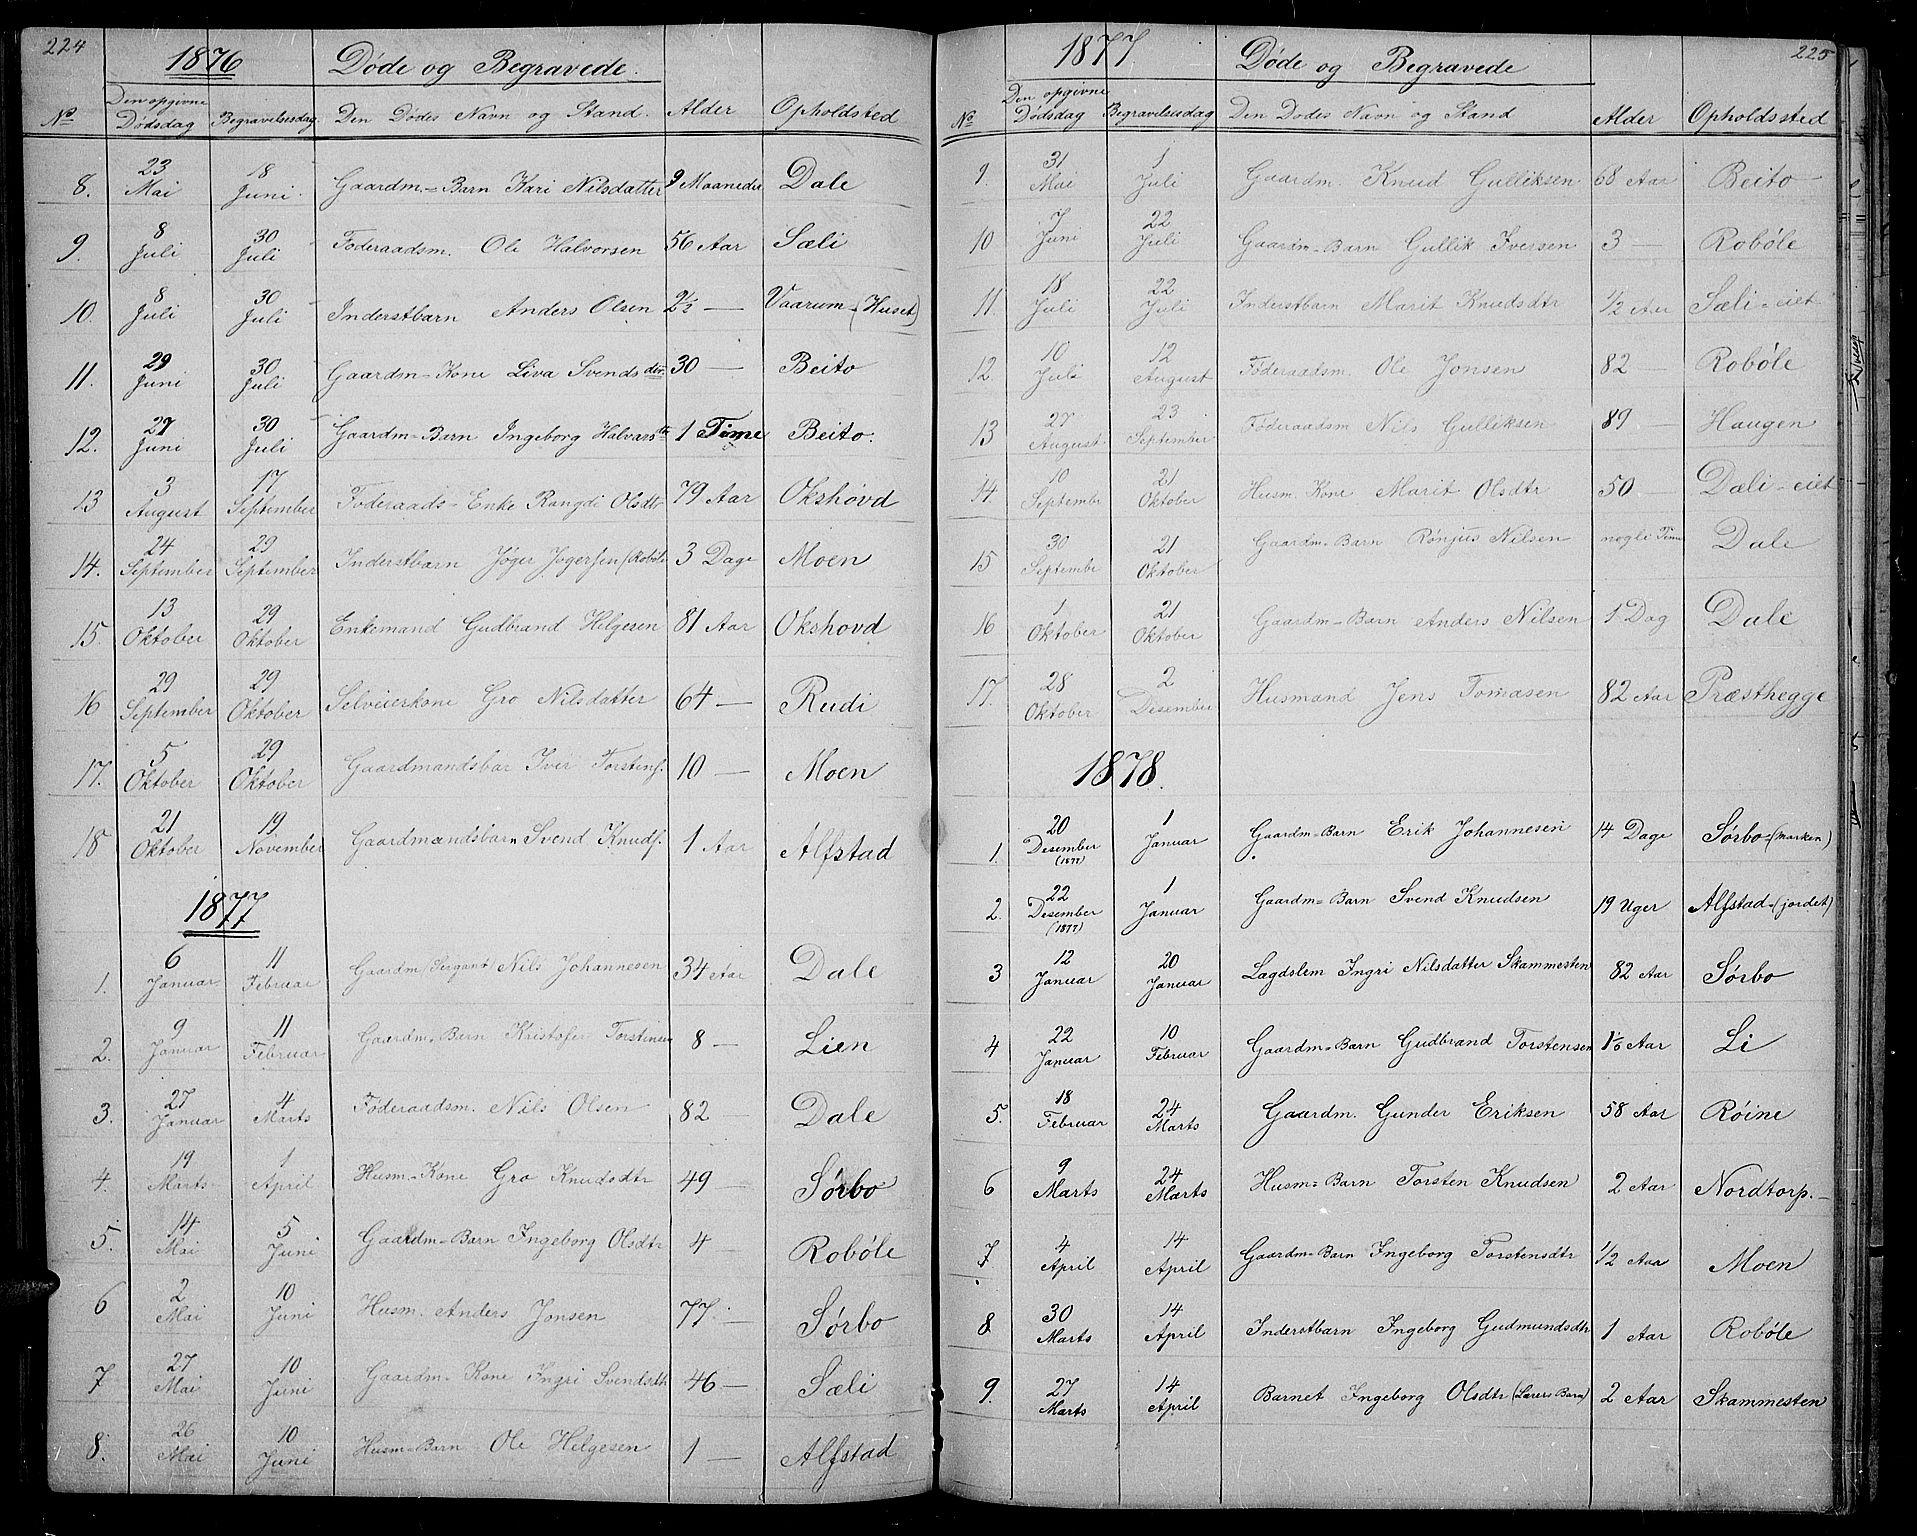 SAH, Øystre Slidre prestekontor, Klokkerbok nr. 1, 1866-1886, s. 224-225